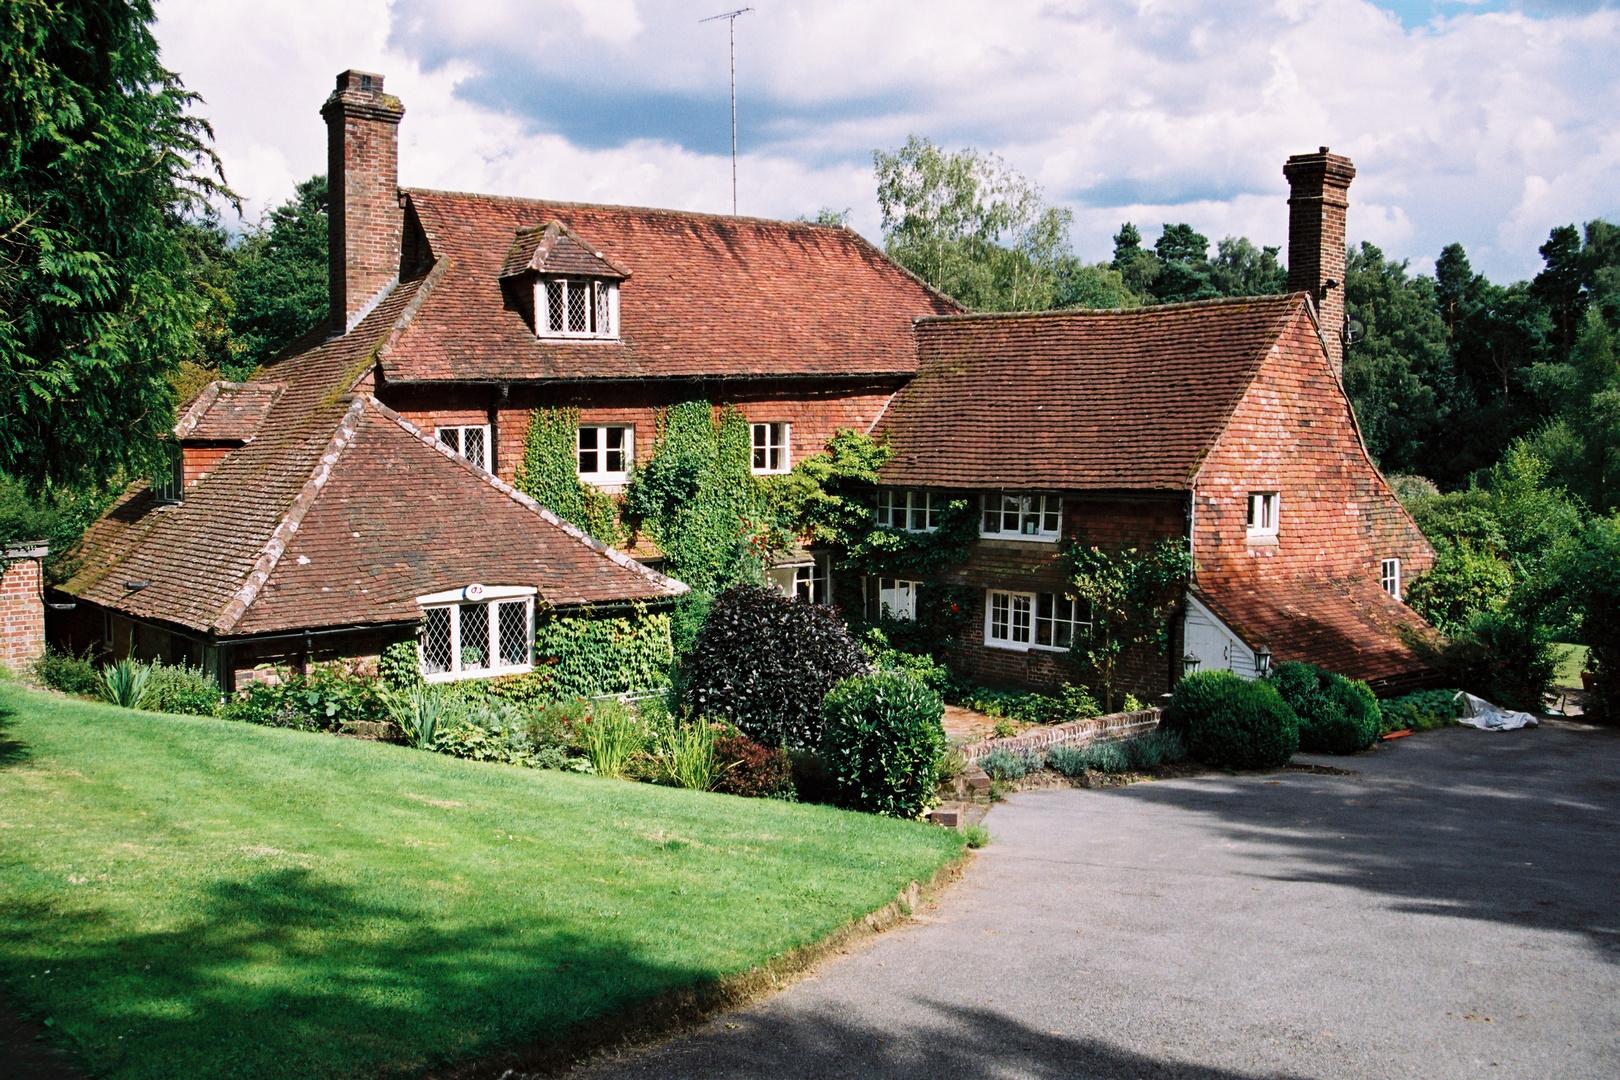 Cotchford Farm, East Sussex / 2007